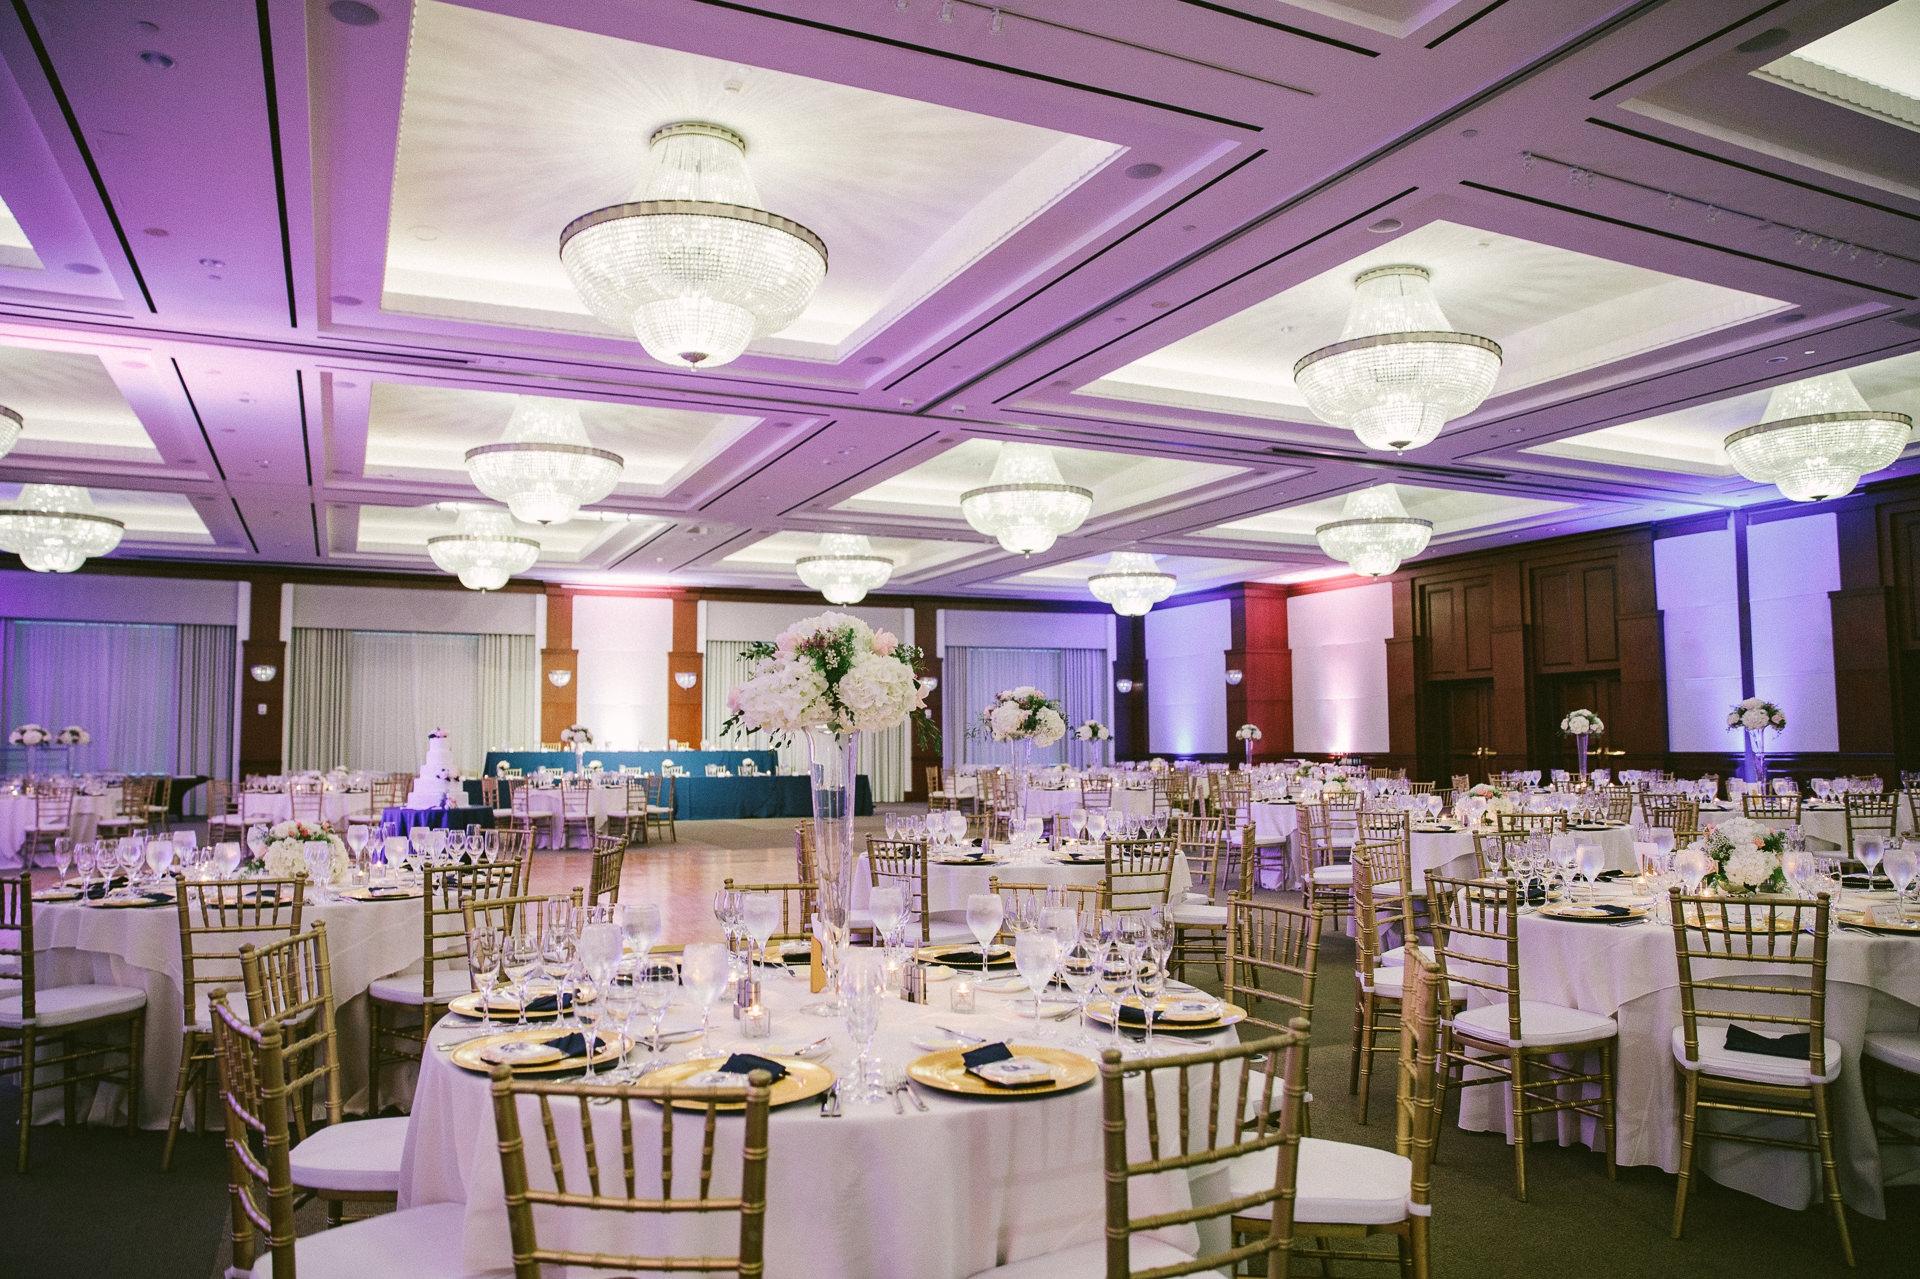 Intercontinental Hotel Wedding in Cleveland 2 29.jpg